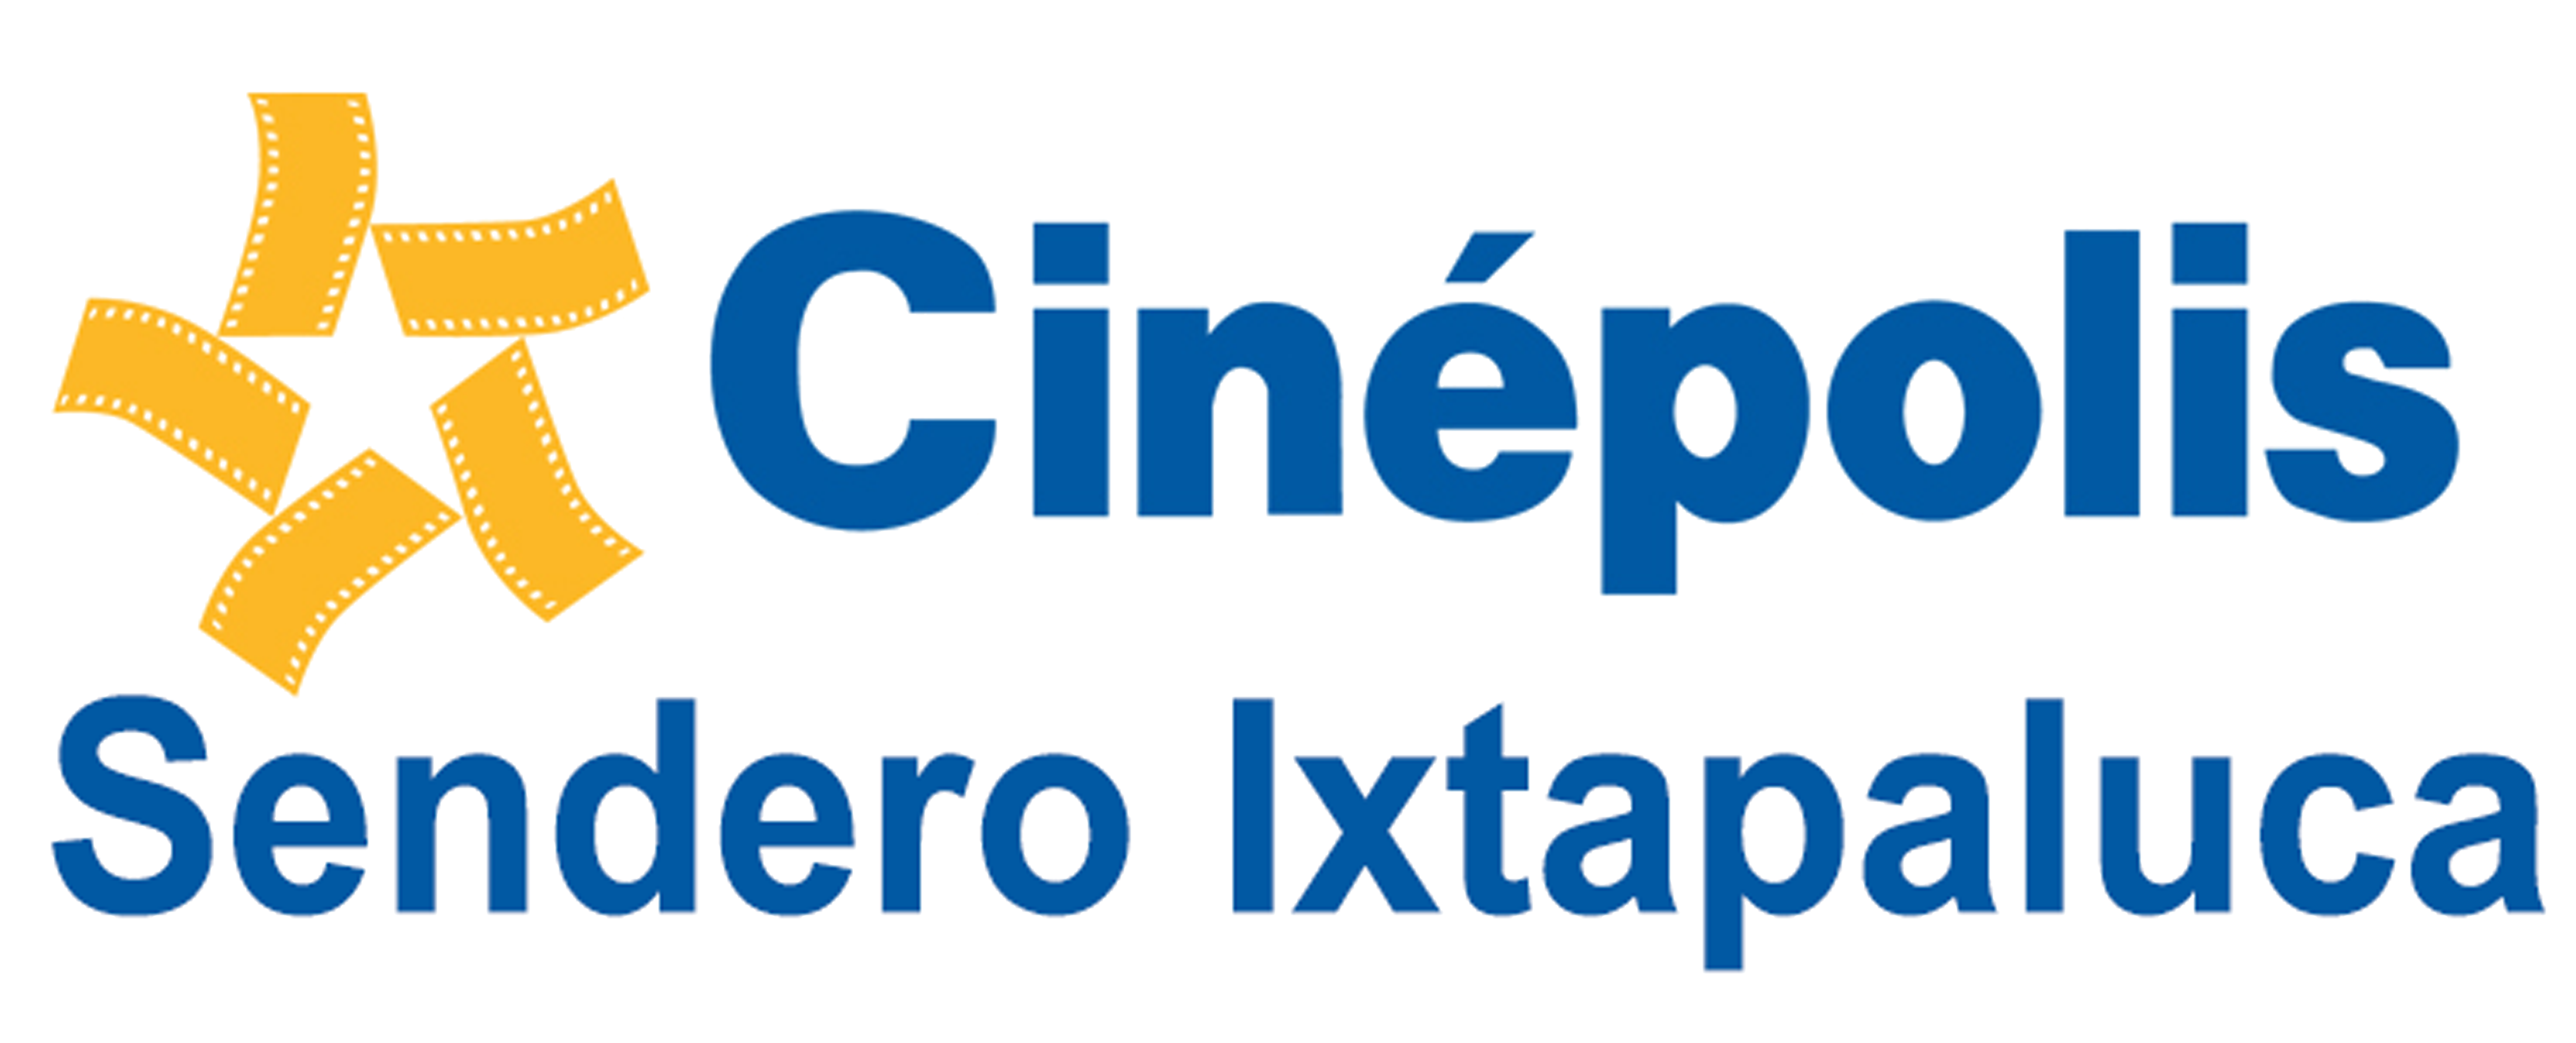 cinepolis transparente.png